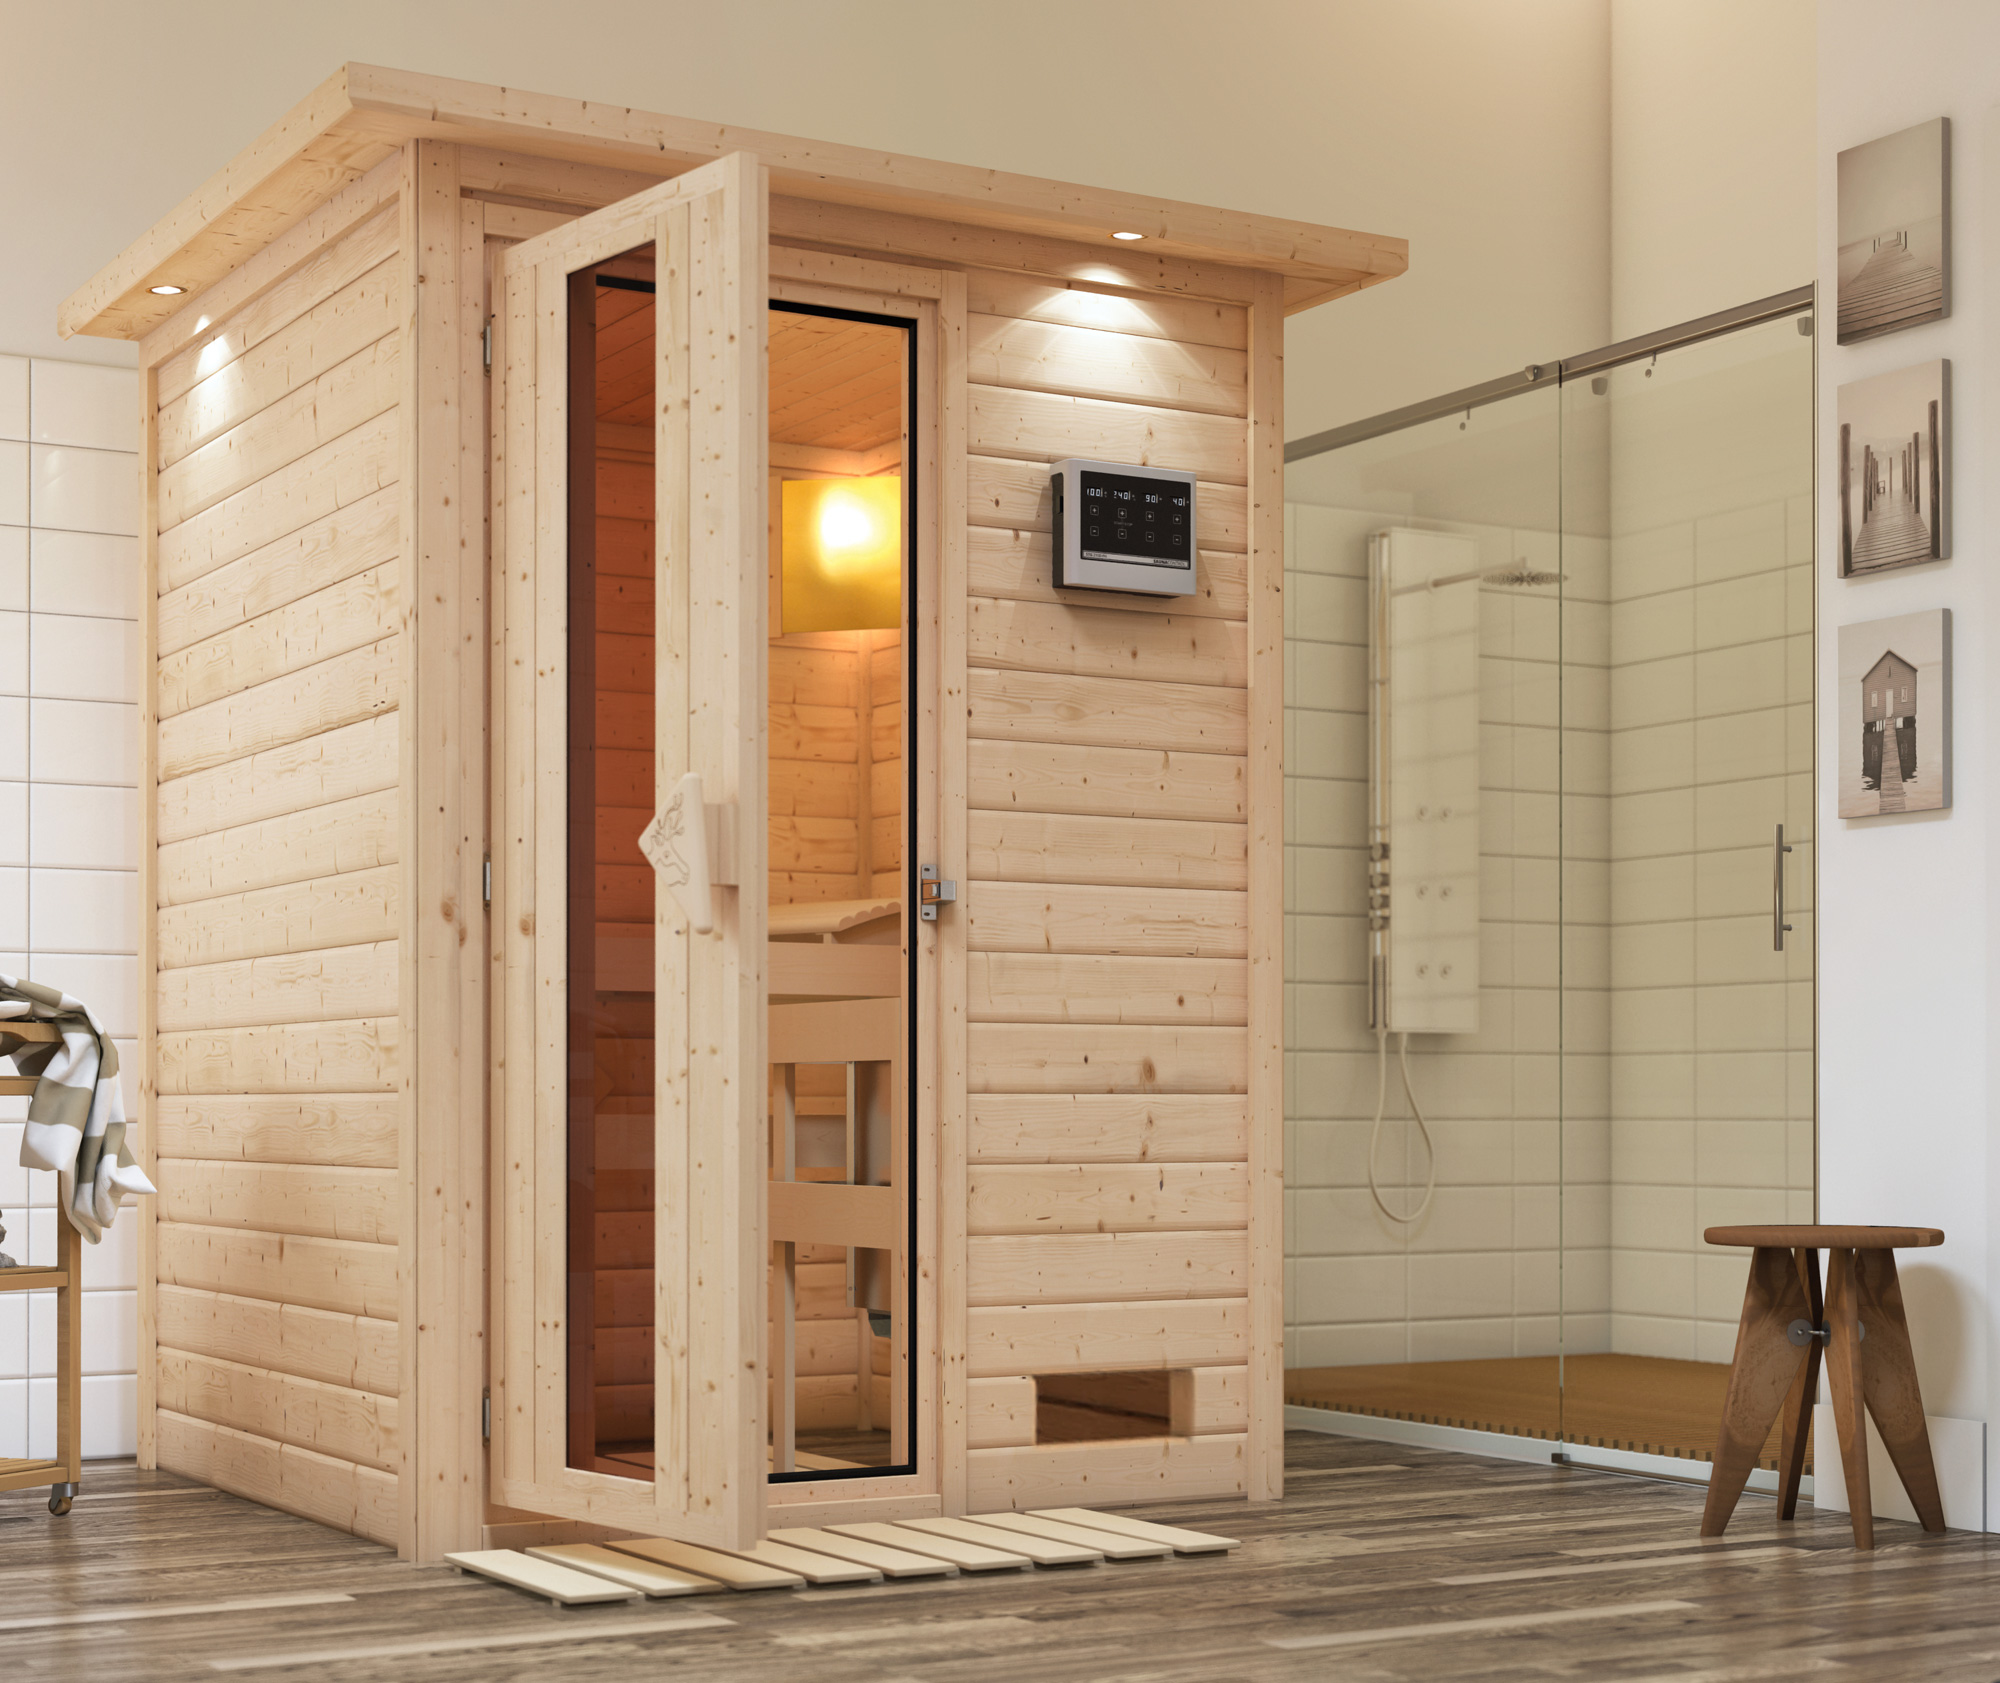 Woodfeeling Sauna Svenja 38mm Bio Saunaofen 9kW Dachkranz Holztür Bild 1